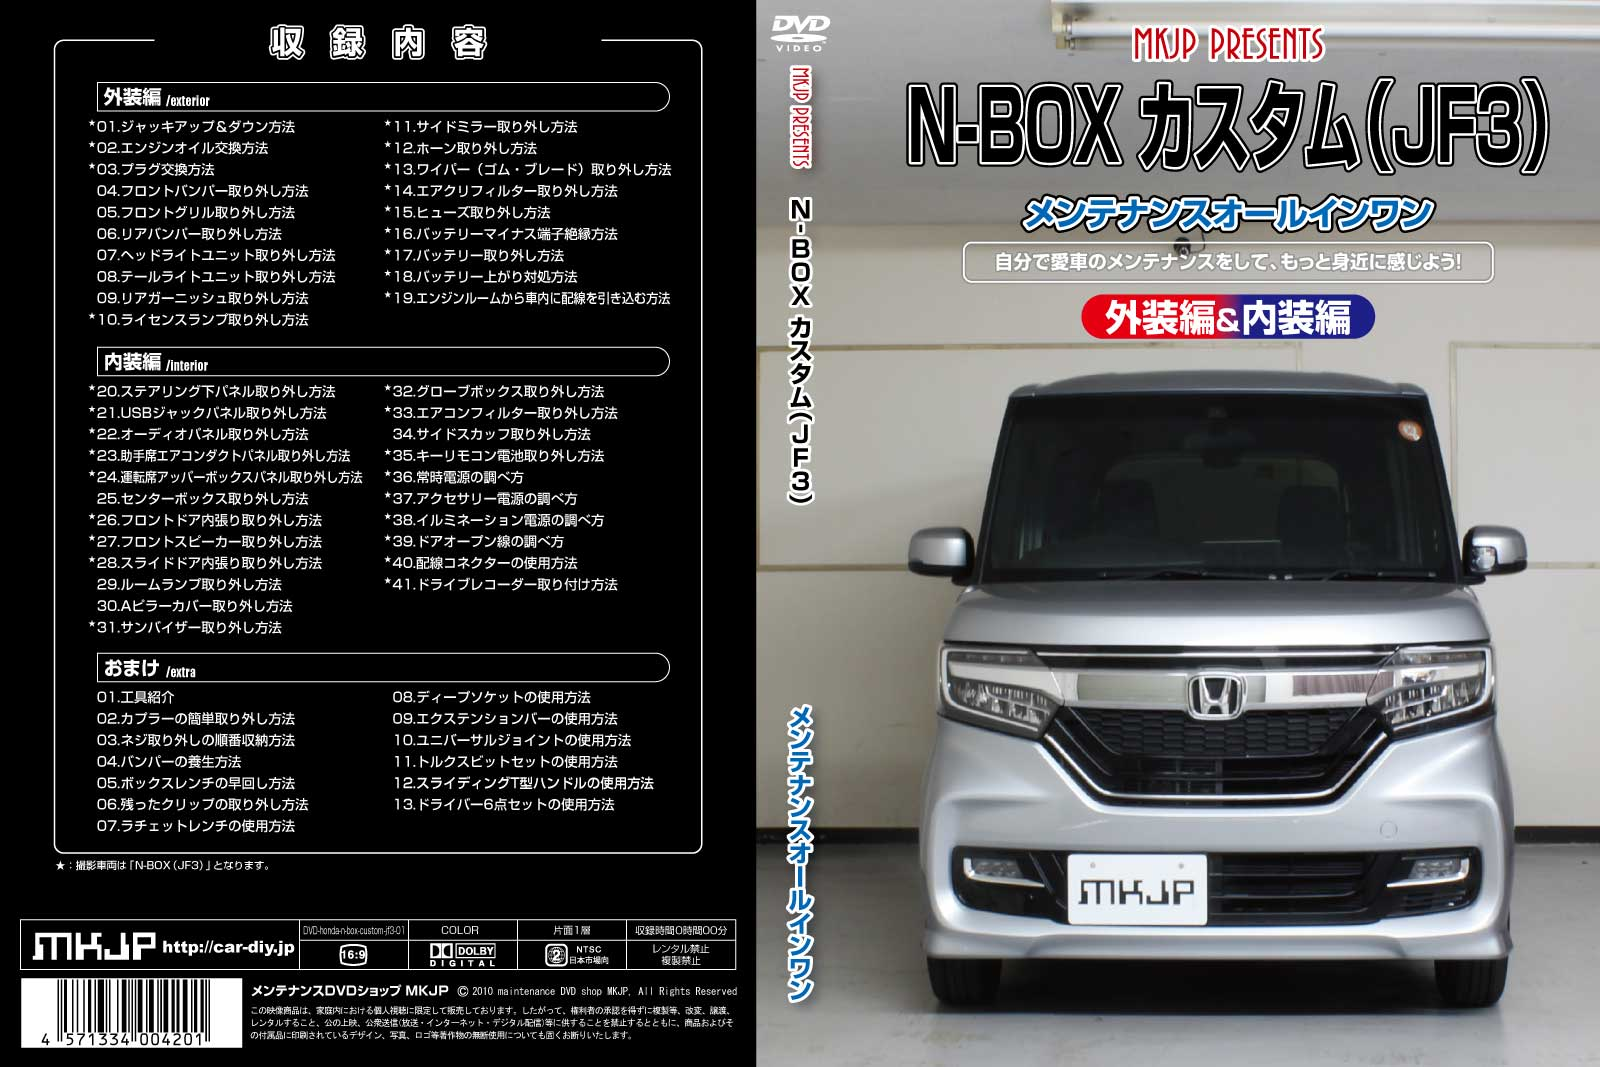 MKJP メンテナンスDVD Vol.1 通常版 N-BOXカスタム JF3 JF4